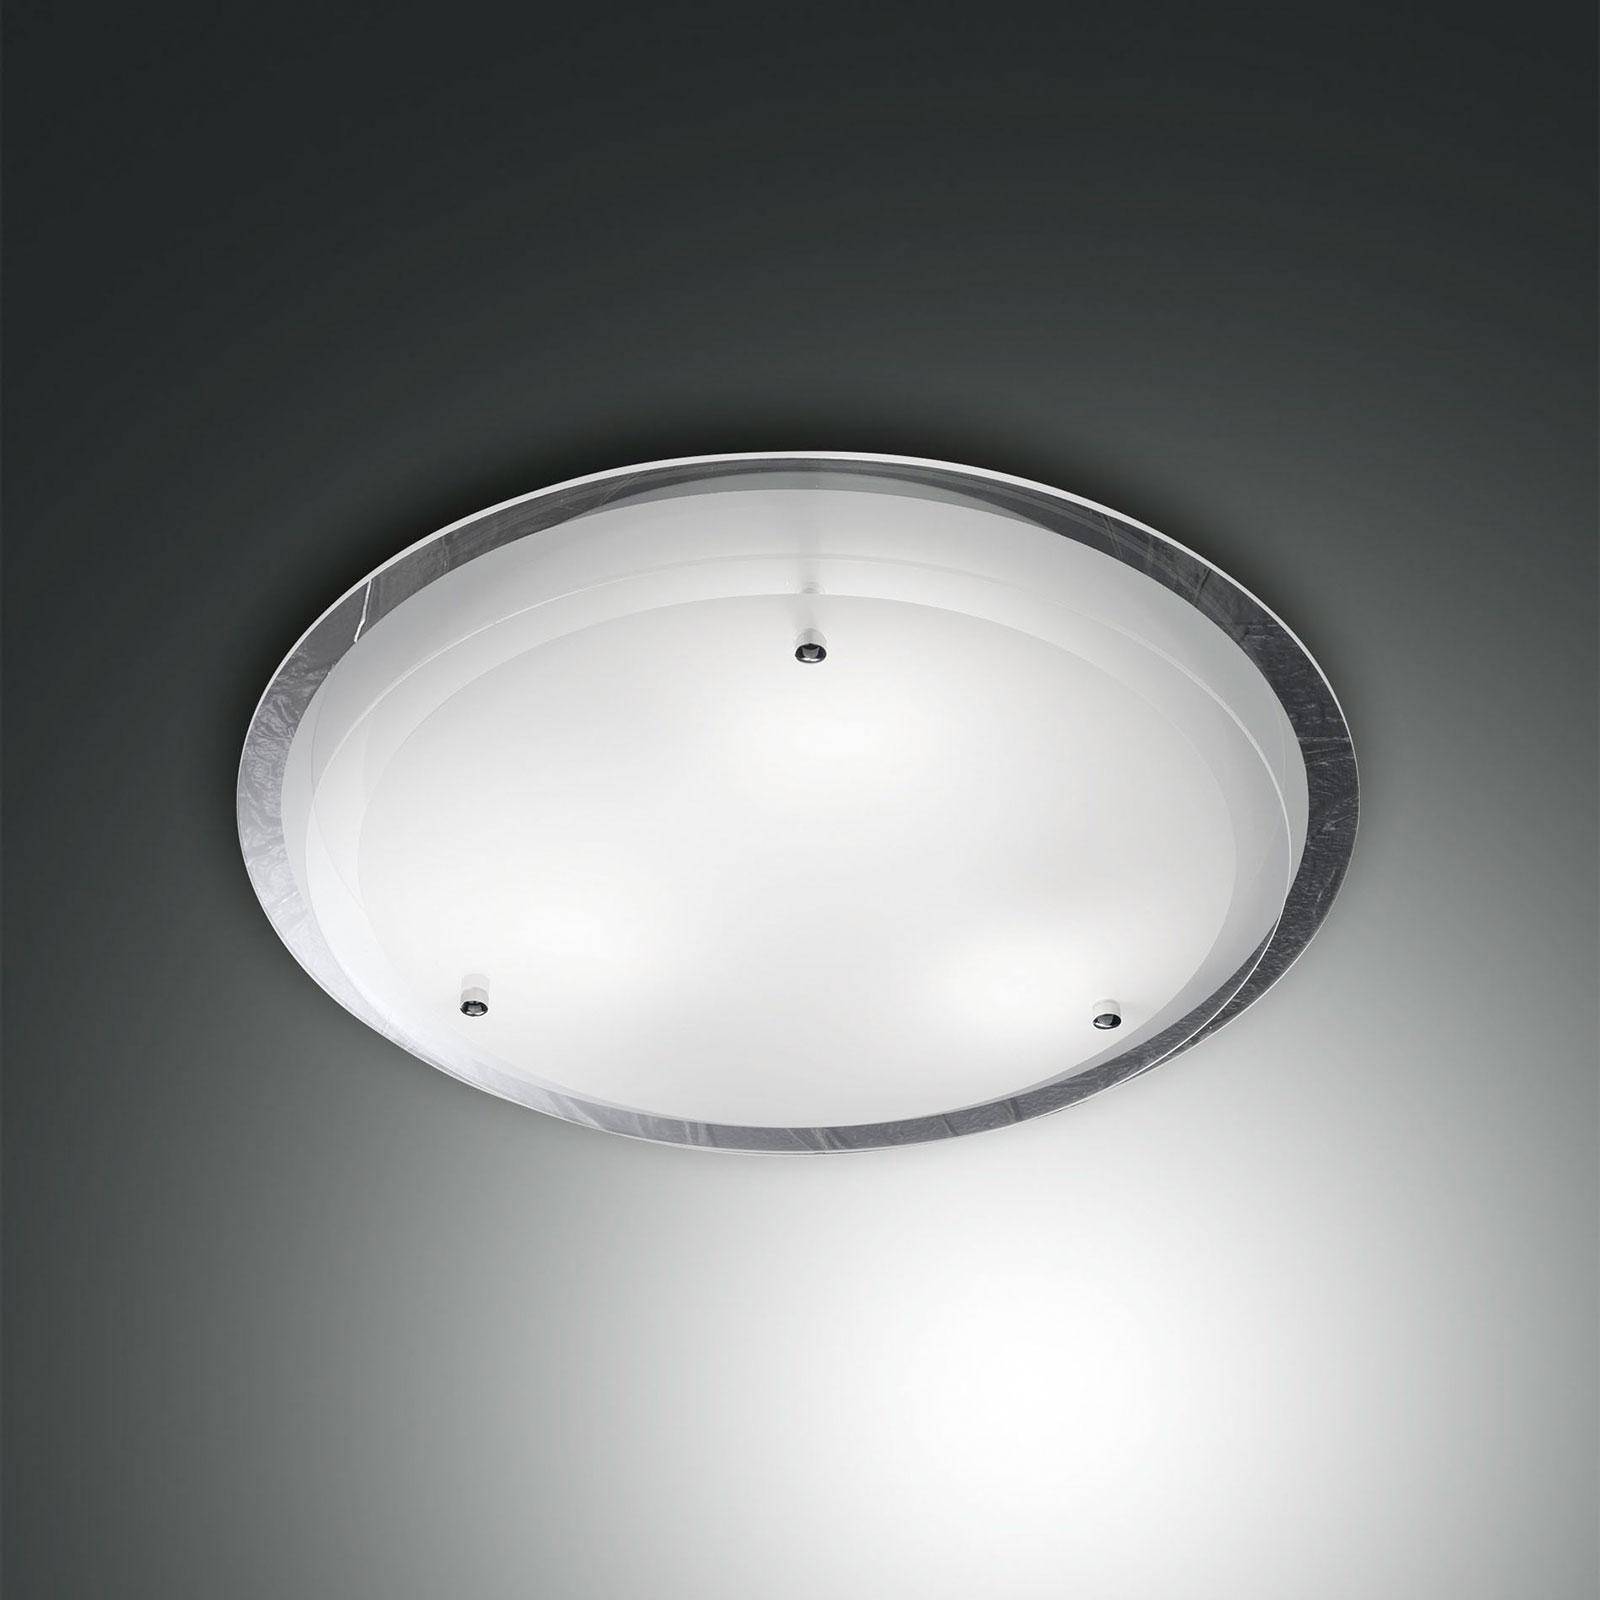 Tijdloze plafondlamp Hill met glas diam. 40 cm